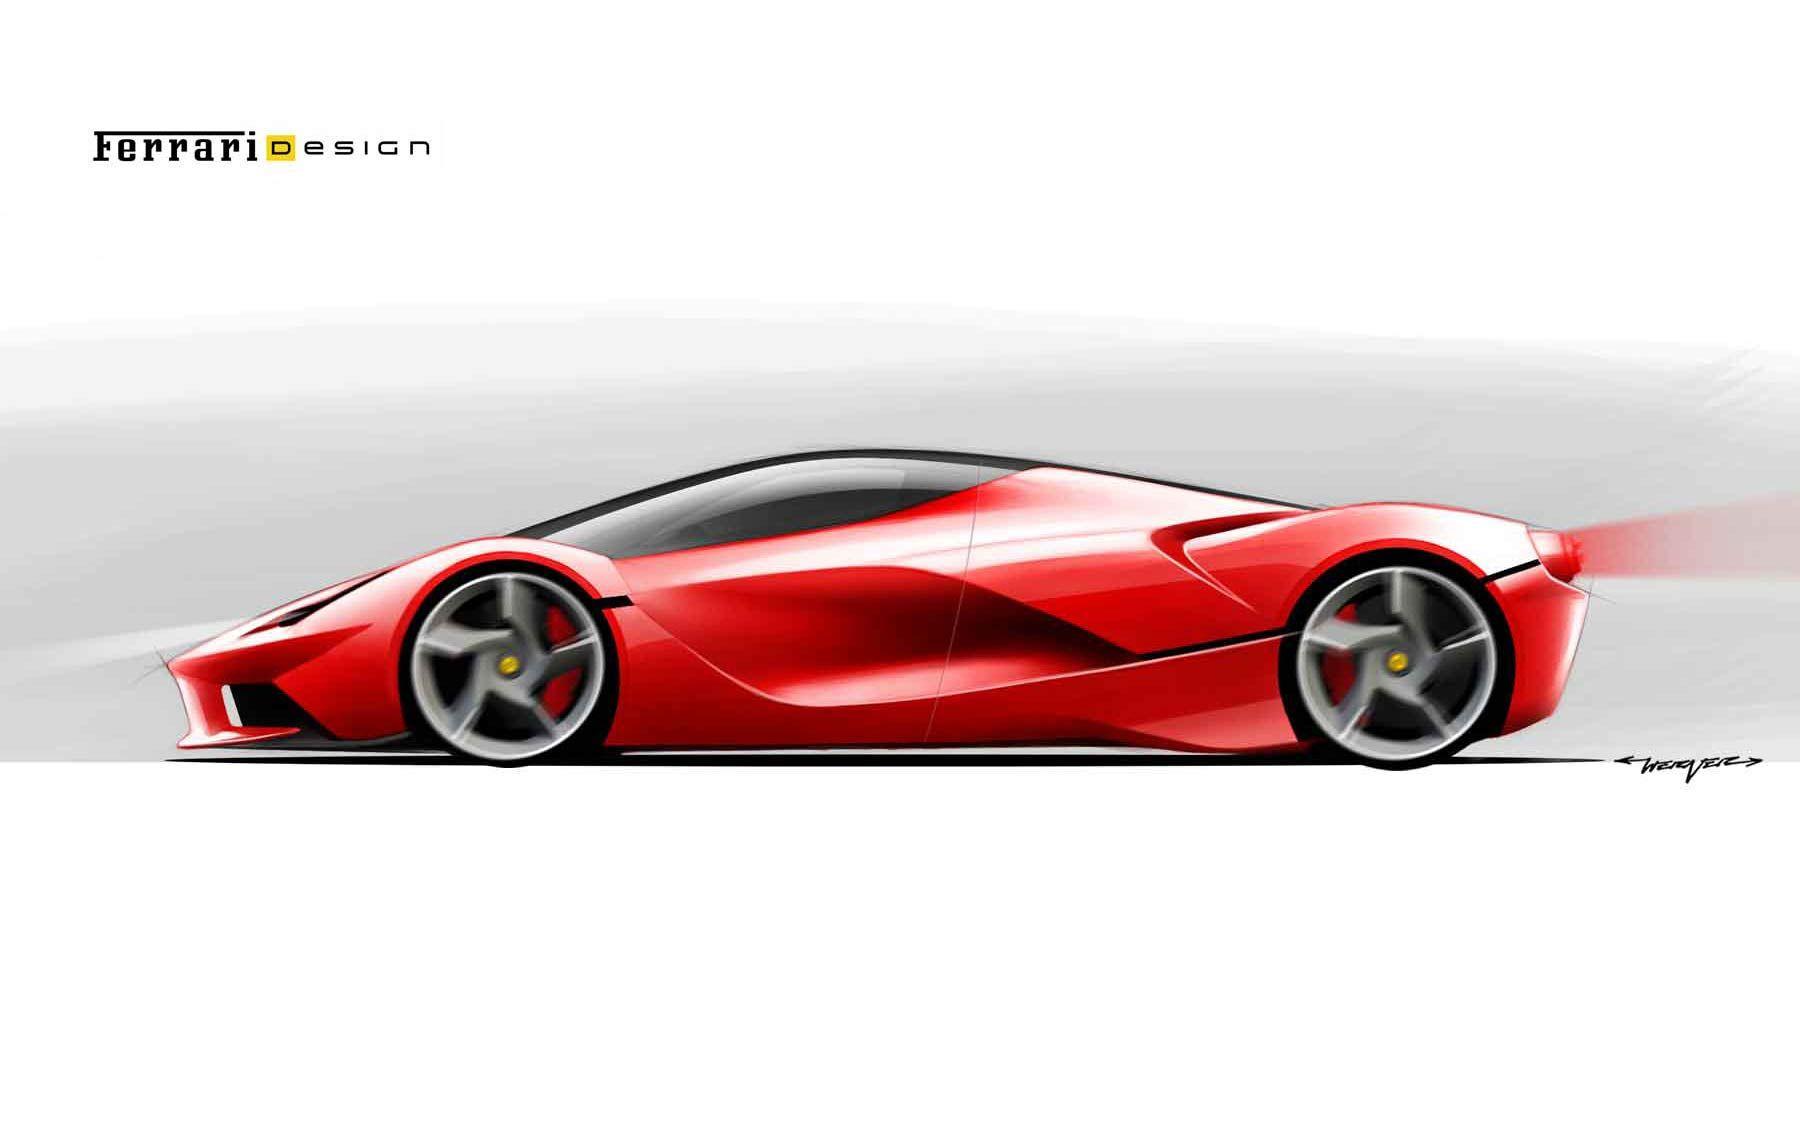 Laferrari Sketch Concept Car Design Concept Car Sketch Car